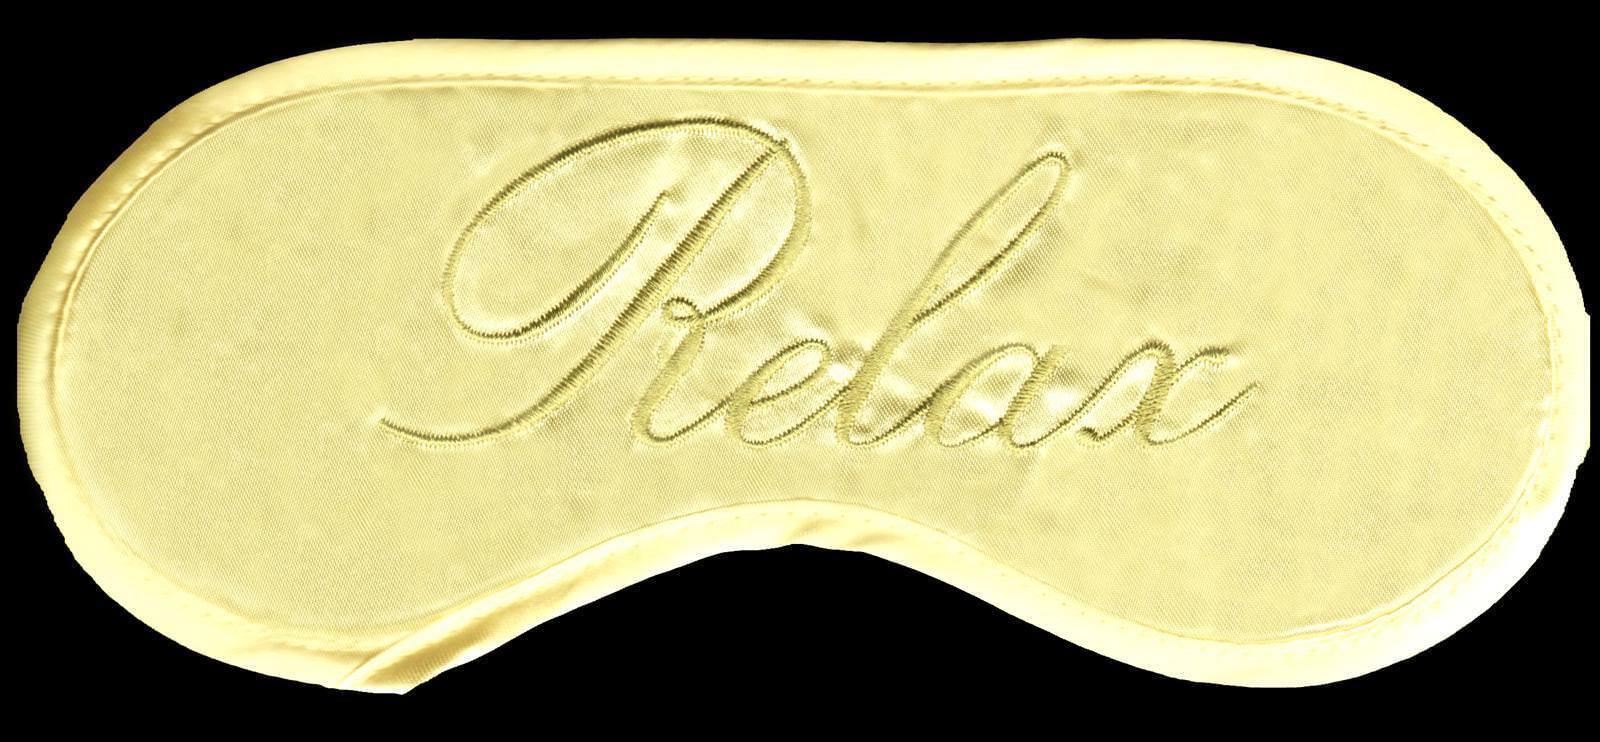 Light Butter YELLOW Satin RELAX Sleep Eye Mask Blindfold Nap Travel USA Seller - $9.99